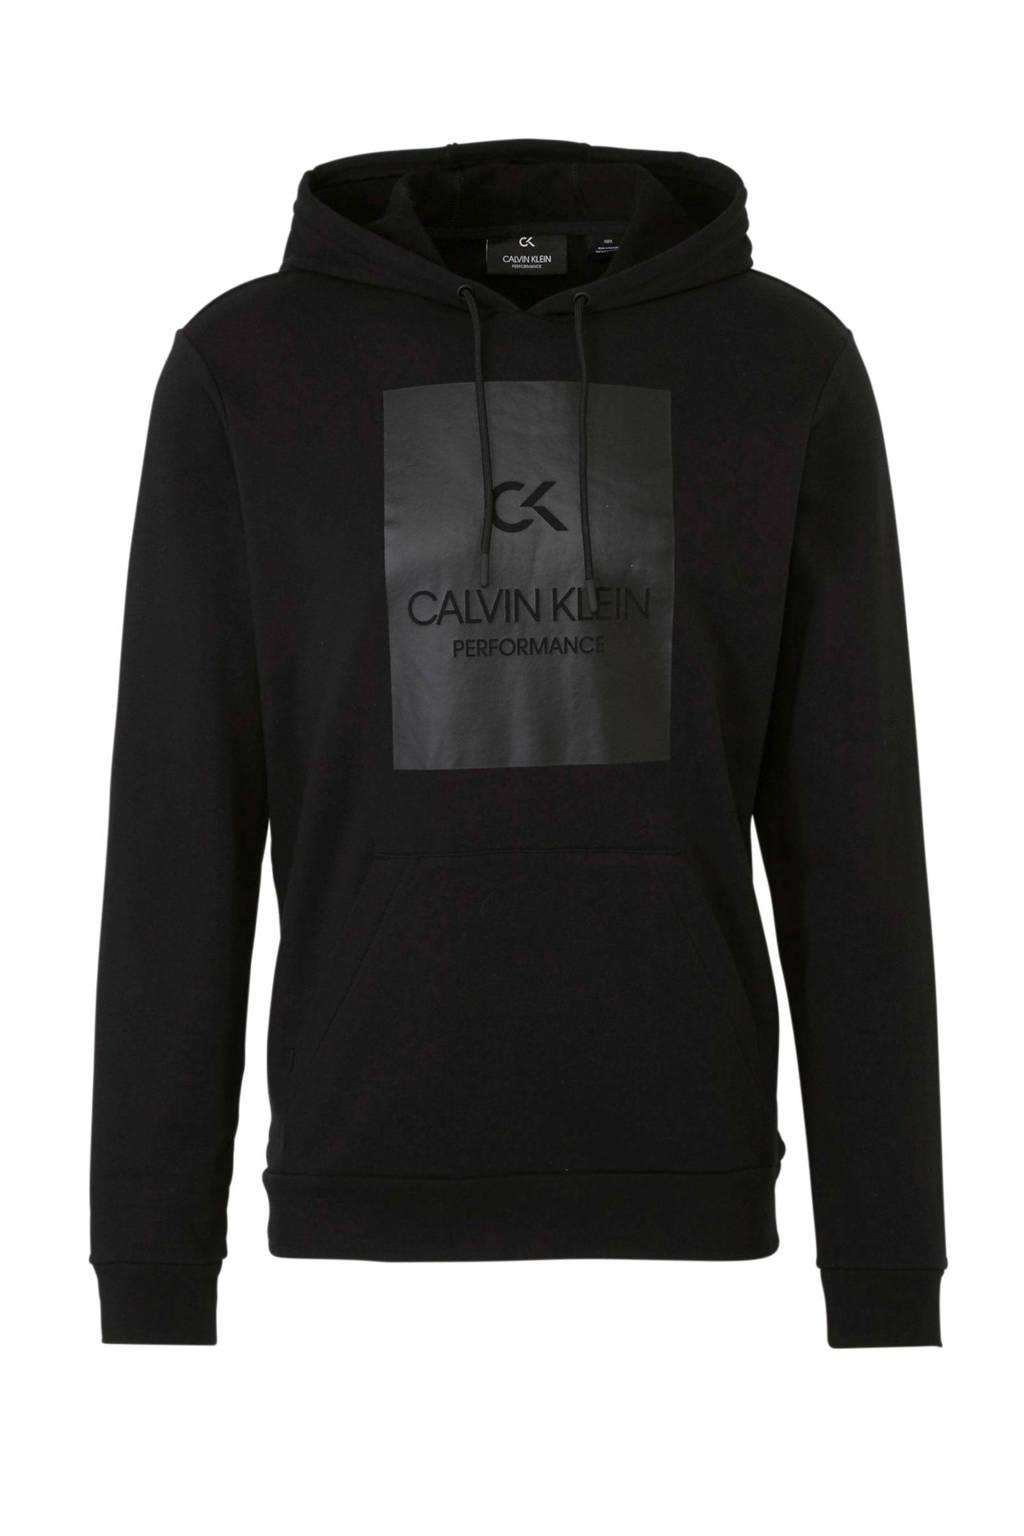 Calvin Klein   sportsweater met printopdruk zwart, Zwart